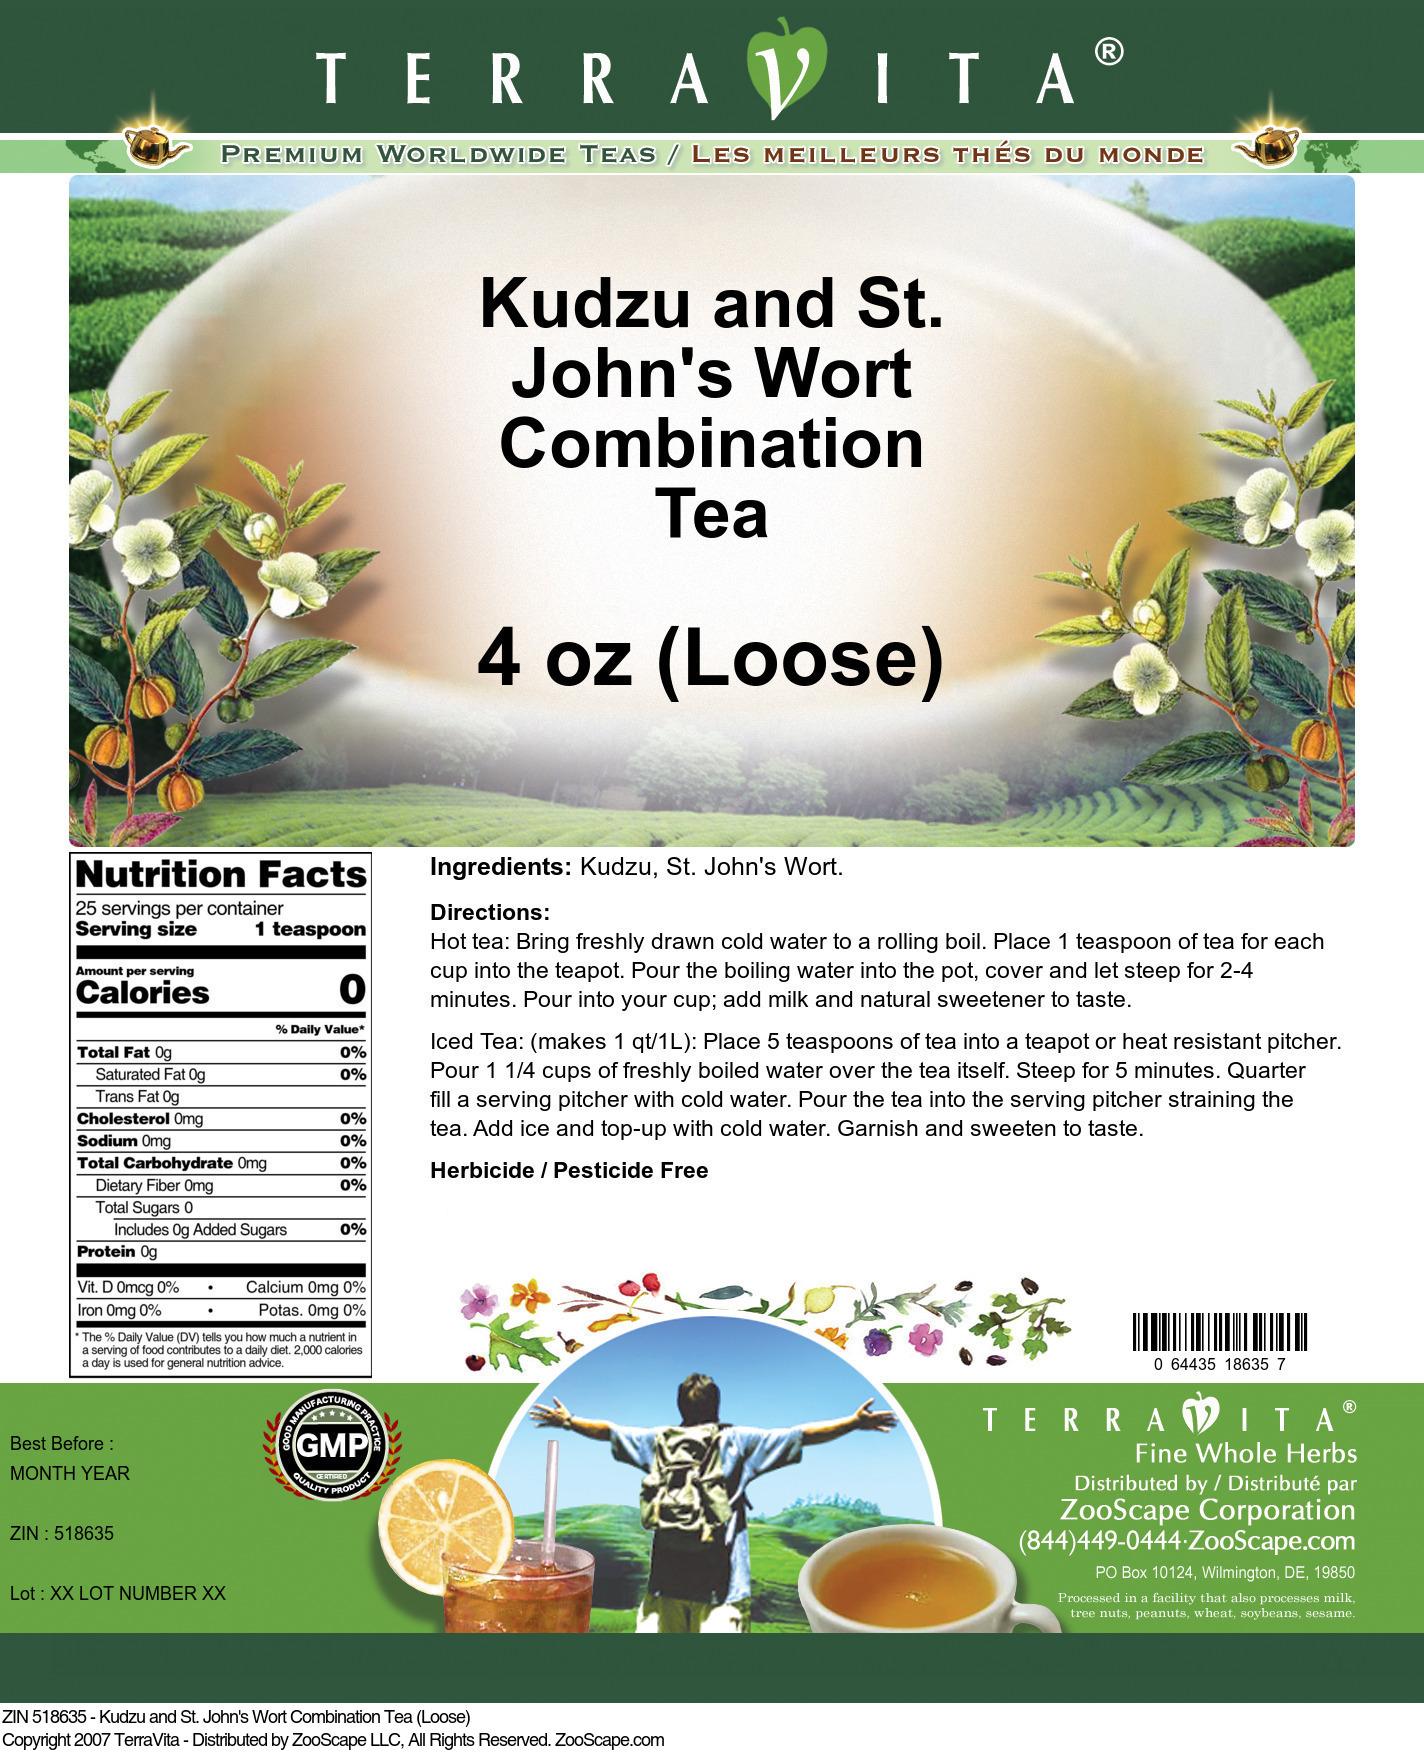 Kudzu and St. John's Wort Combination Tea (Loose)